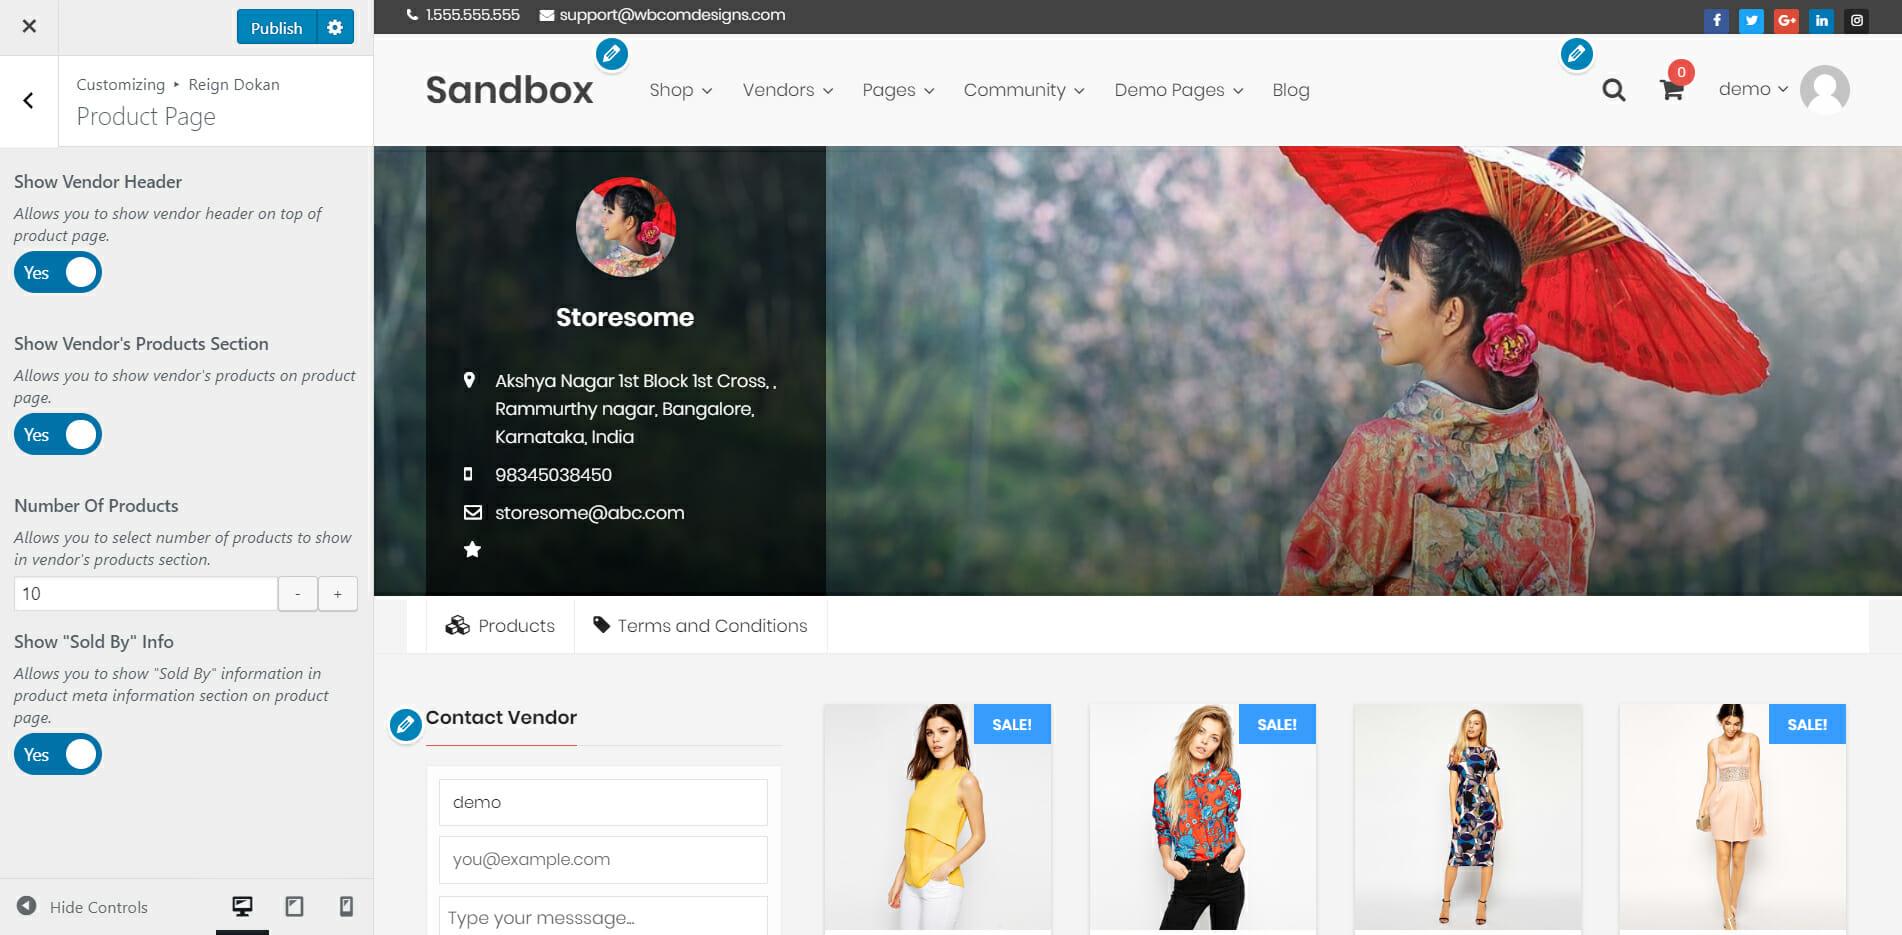 store product pagej - Wbcom Designs